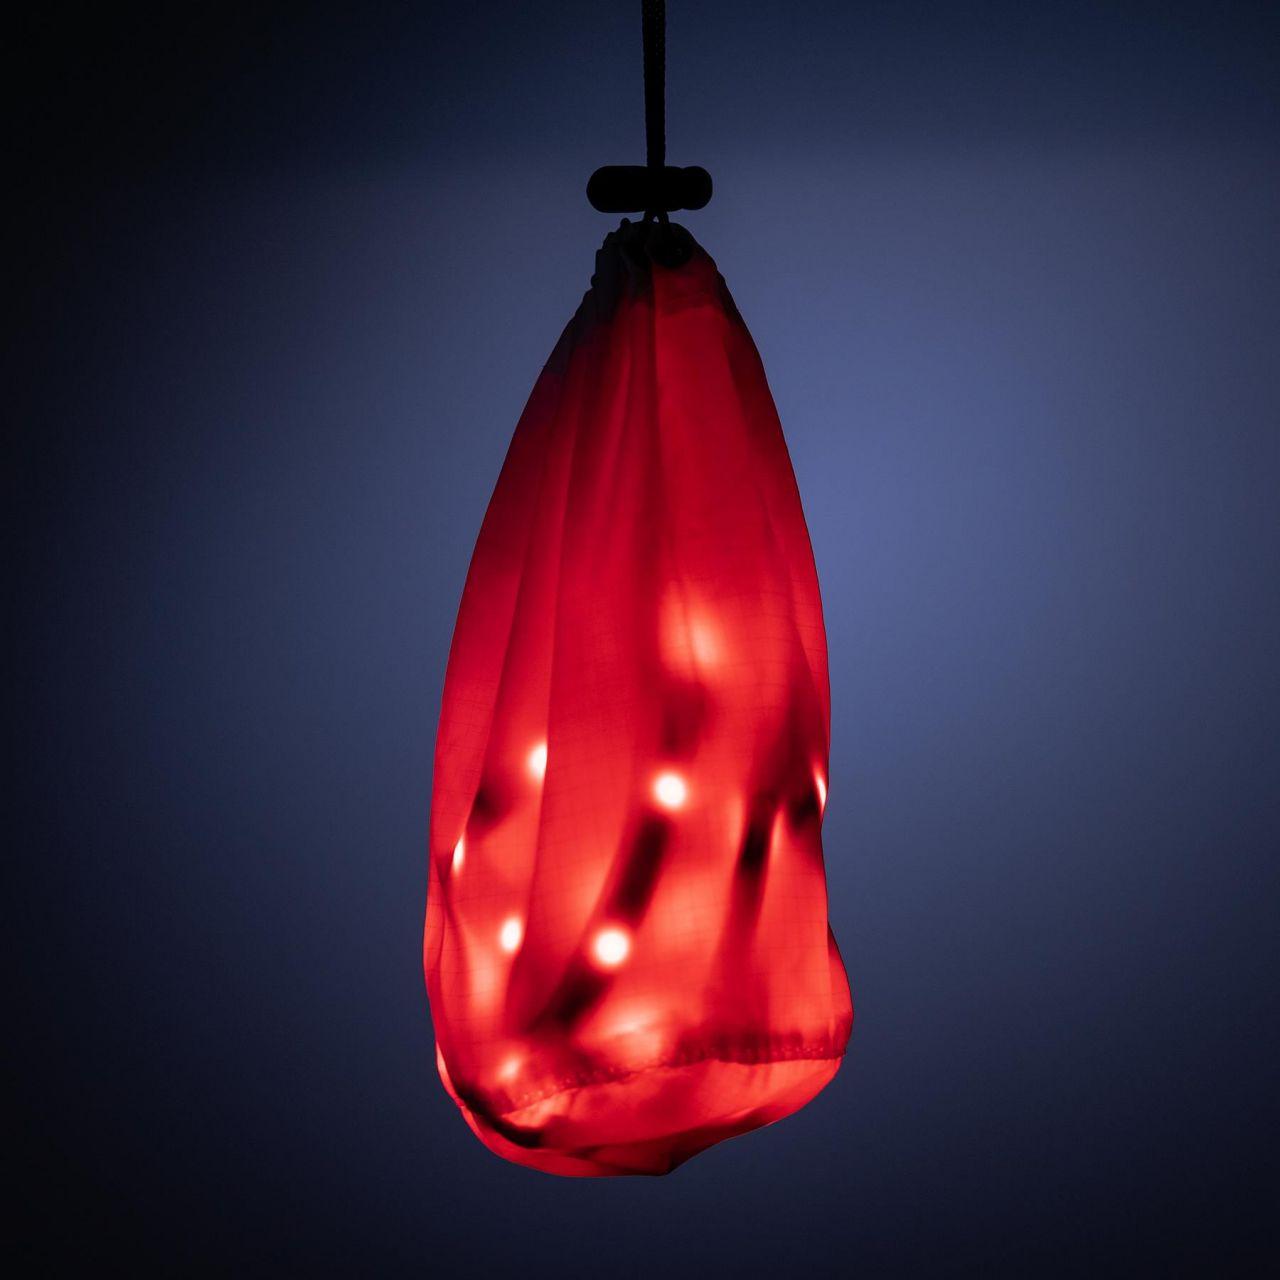 RGB LED Camping-Licht Outdoor batteriebetrieben 5V IP67